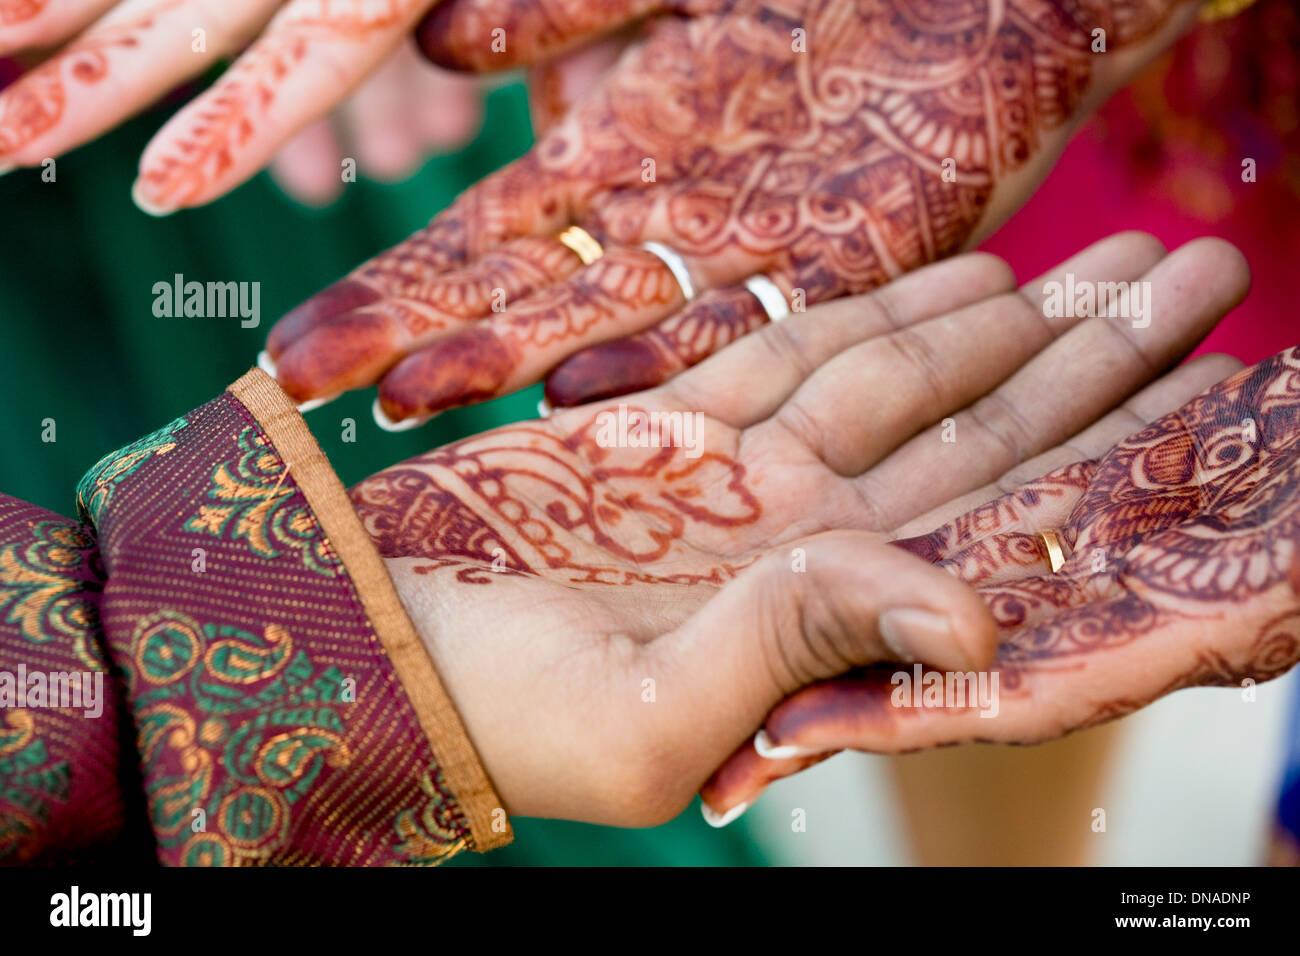 Henna Design Hands Wedding Ceremony Tradition Hindu Love Stock